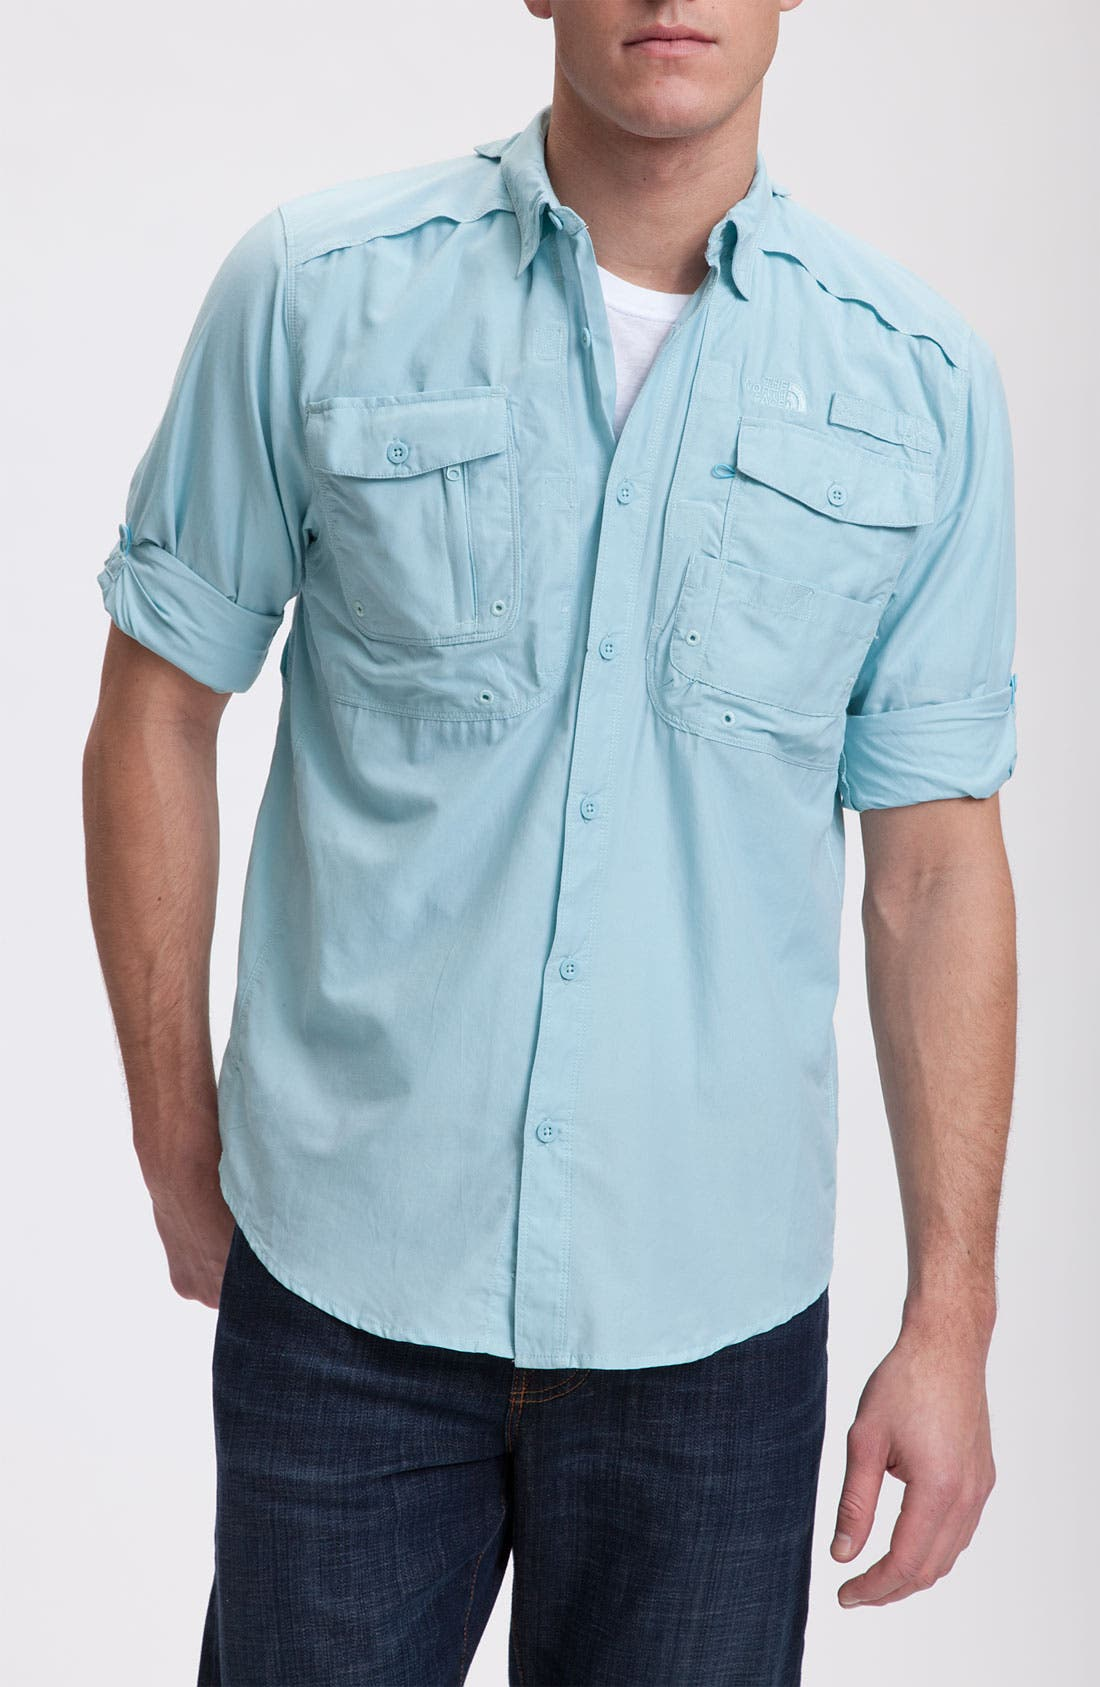 Main Image - The North Face 'Pollock' Woven Shirt